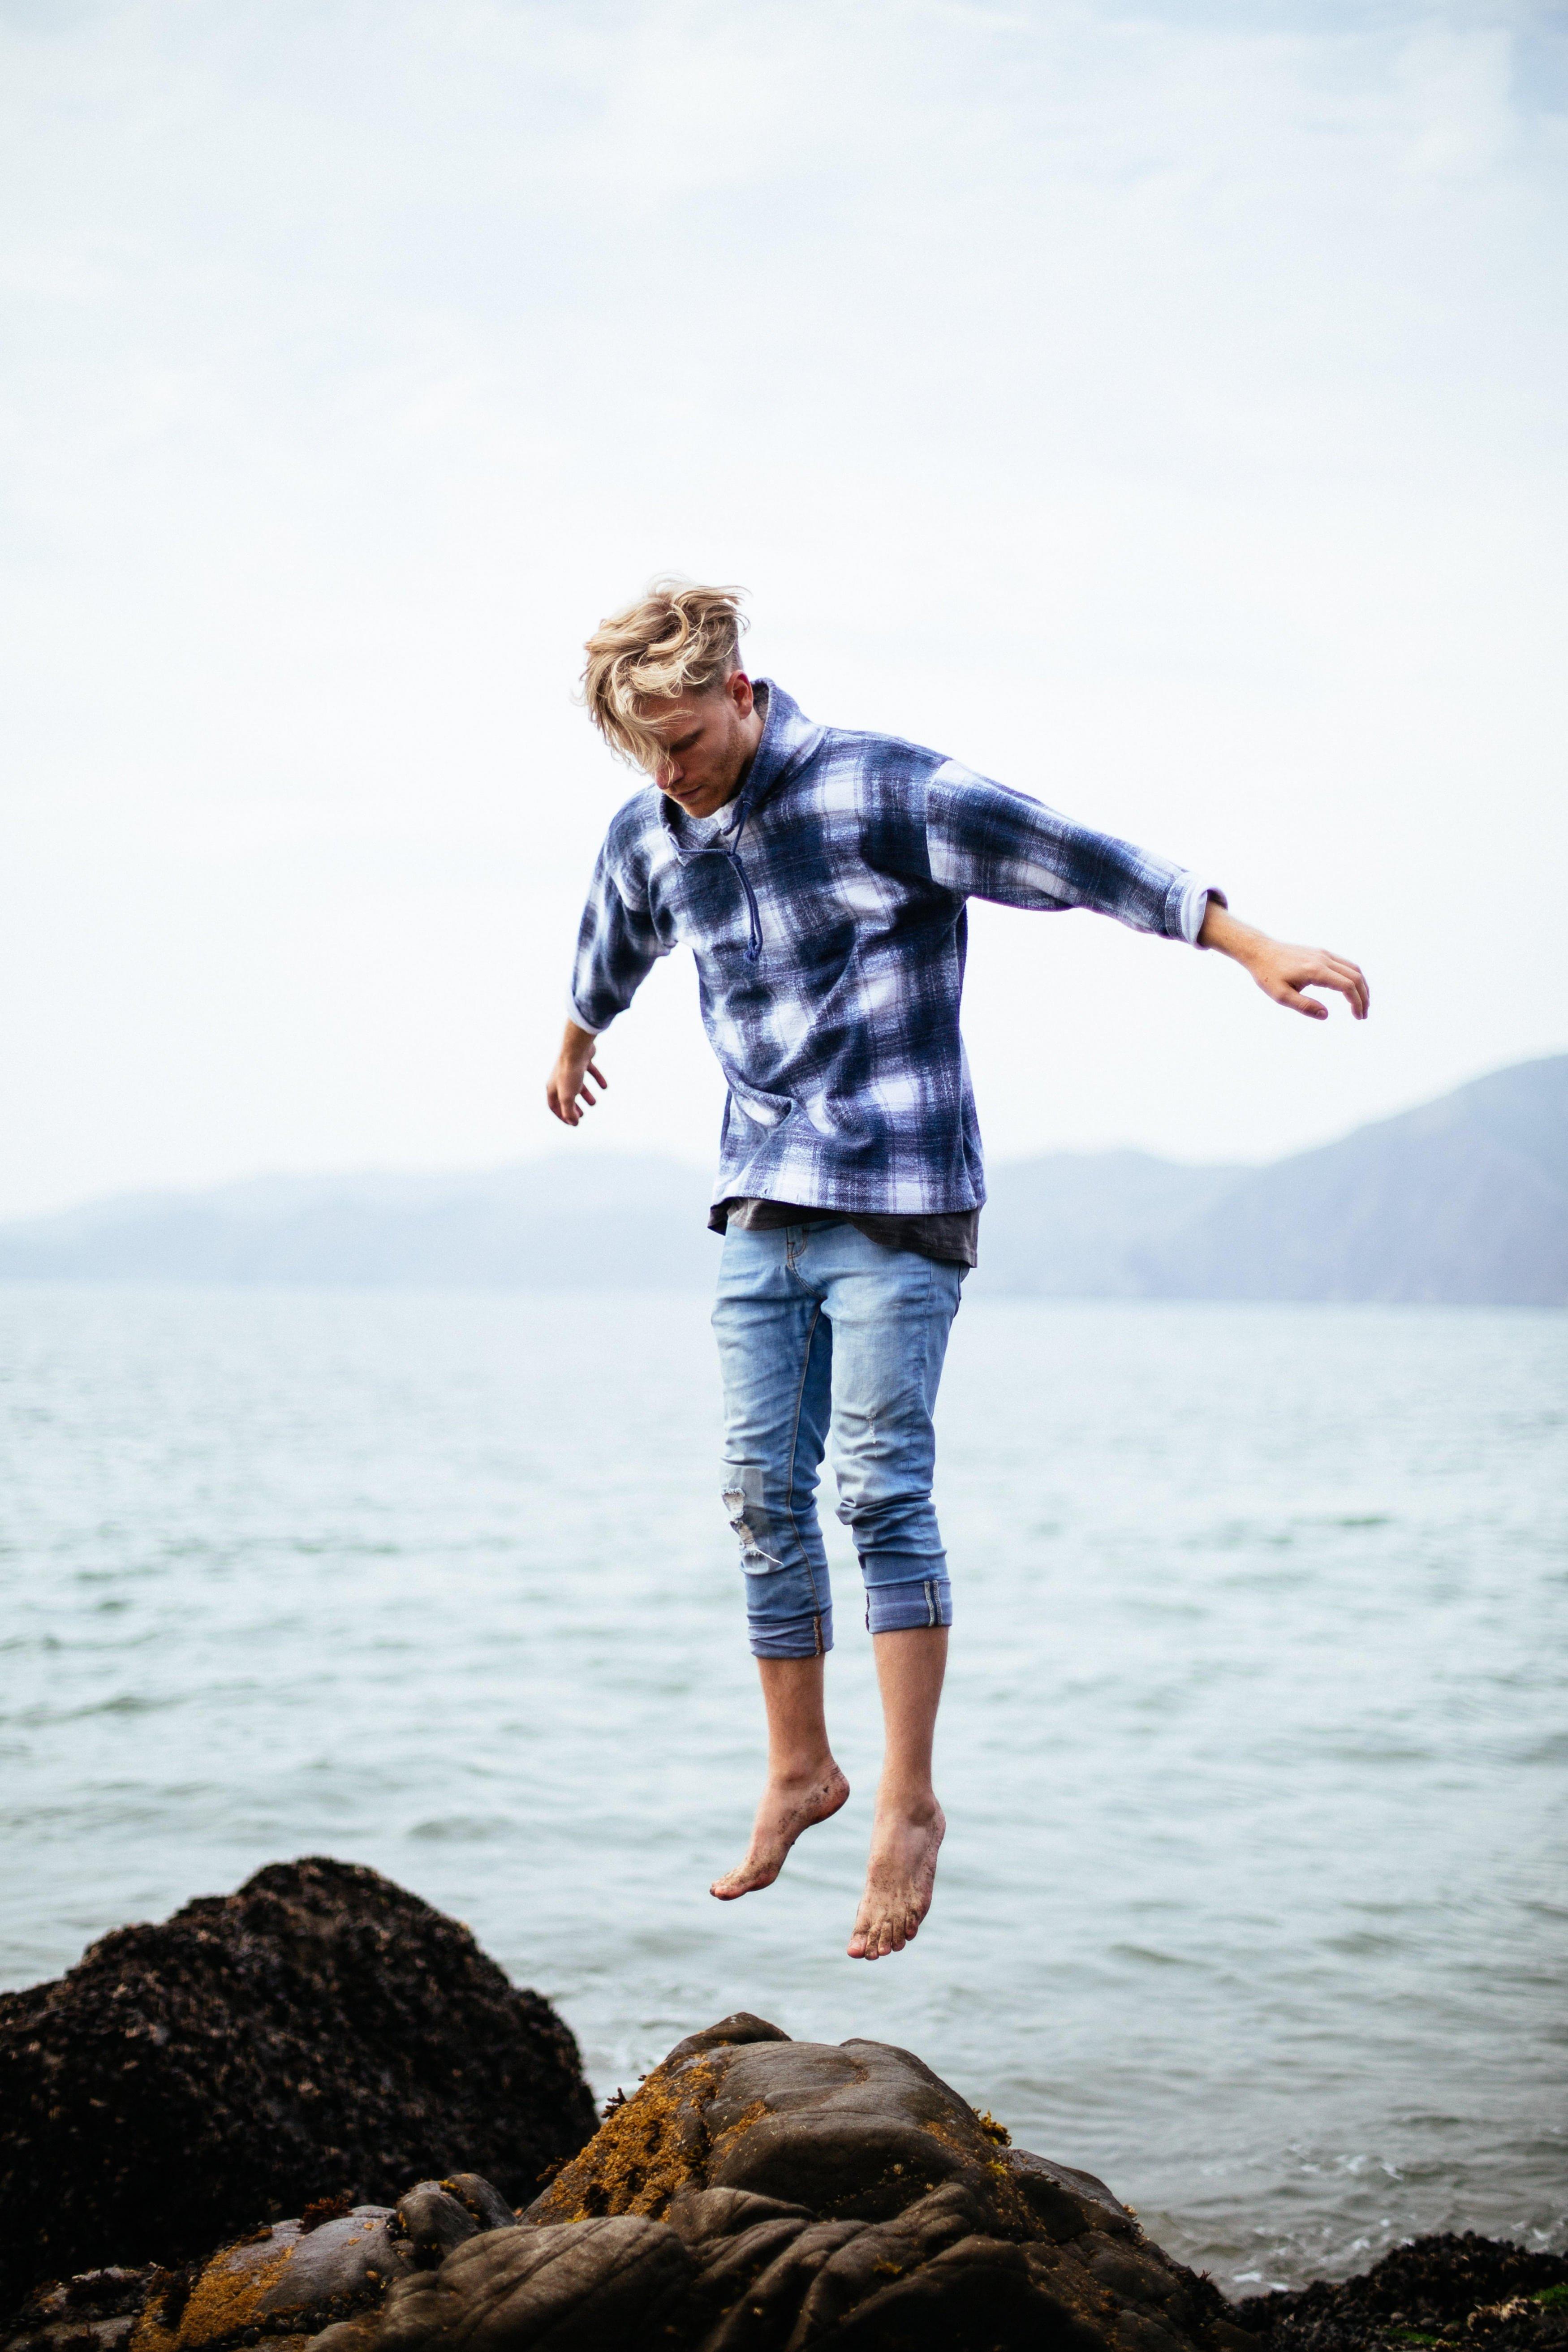 Levitation >> Levitation Photography Techniques And Tips Skylum Blog